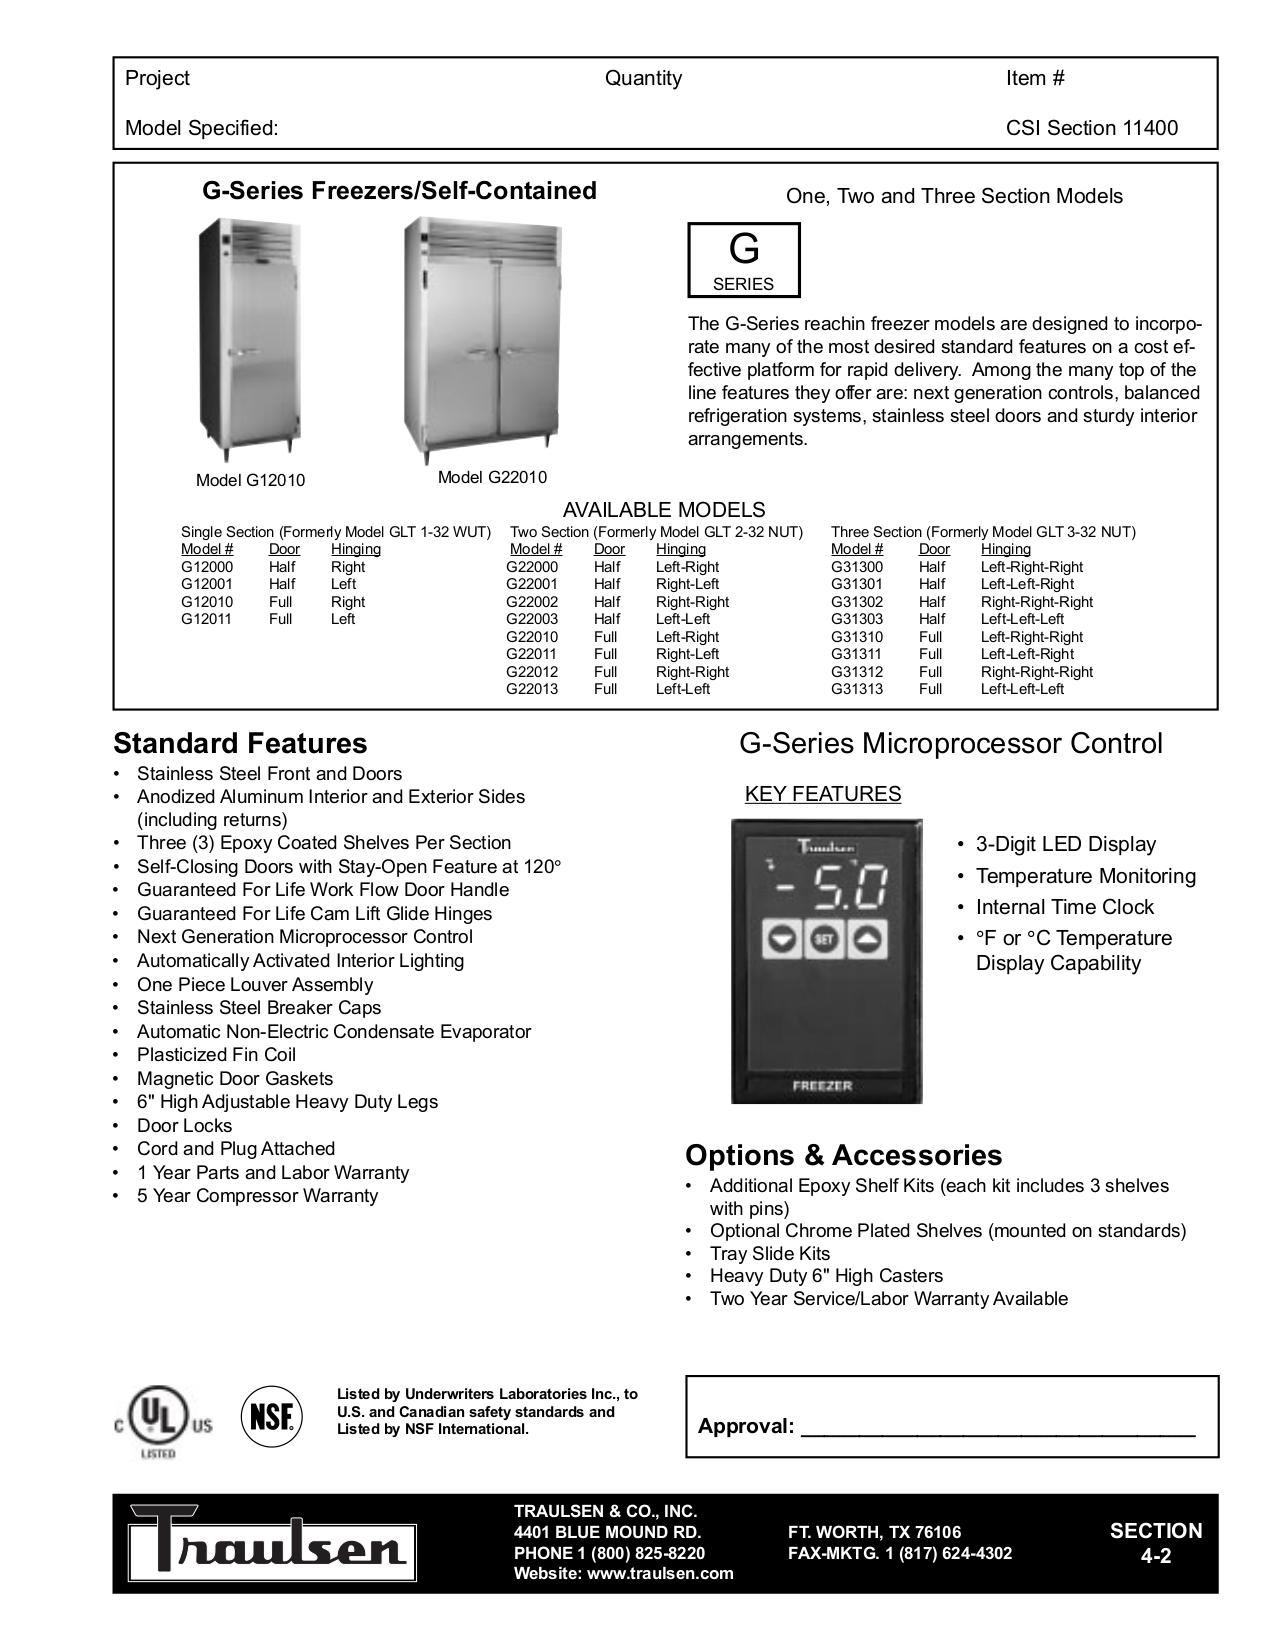 Download Free Pdf For Traulsen G12010 Refrigerator Manual